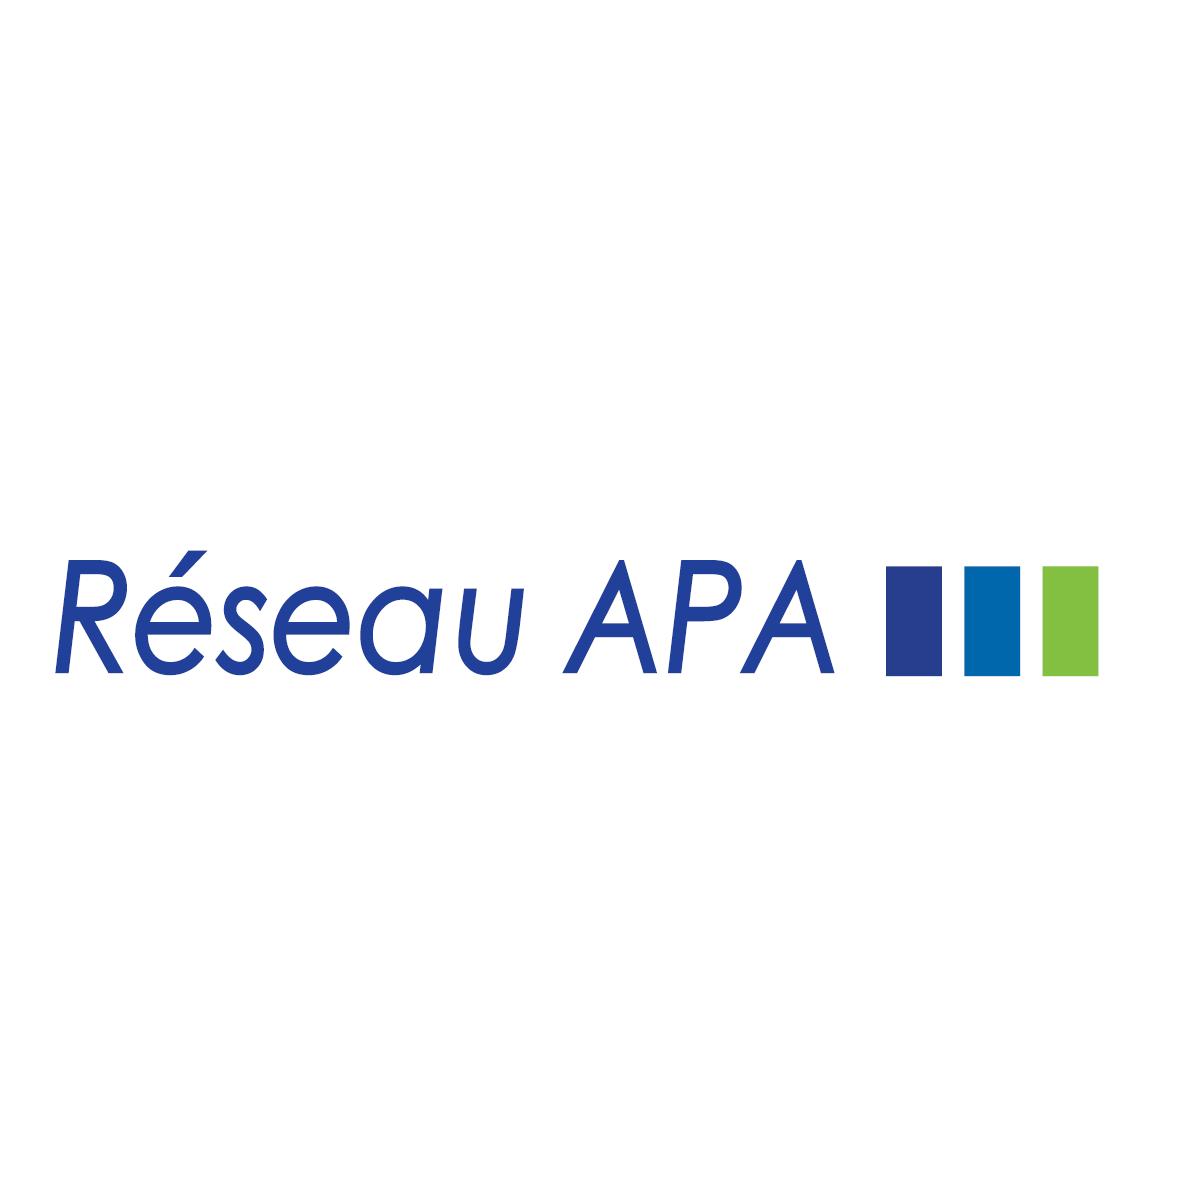 logo-reseauapa_vignette1